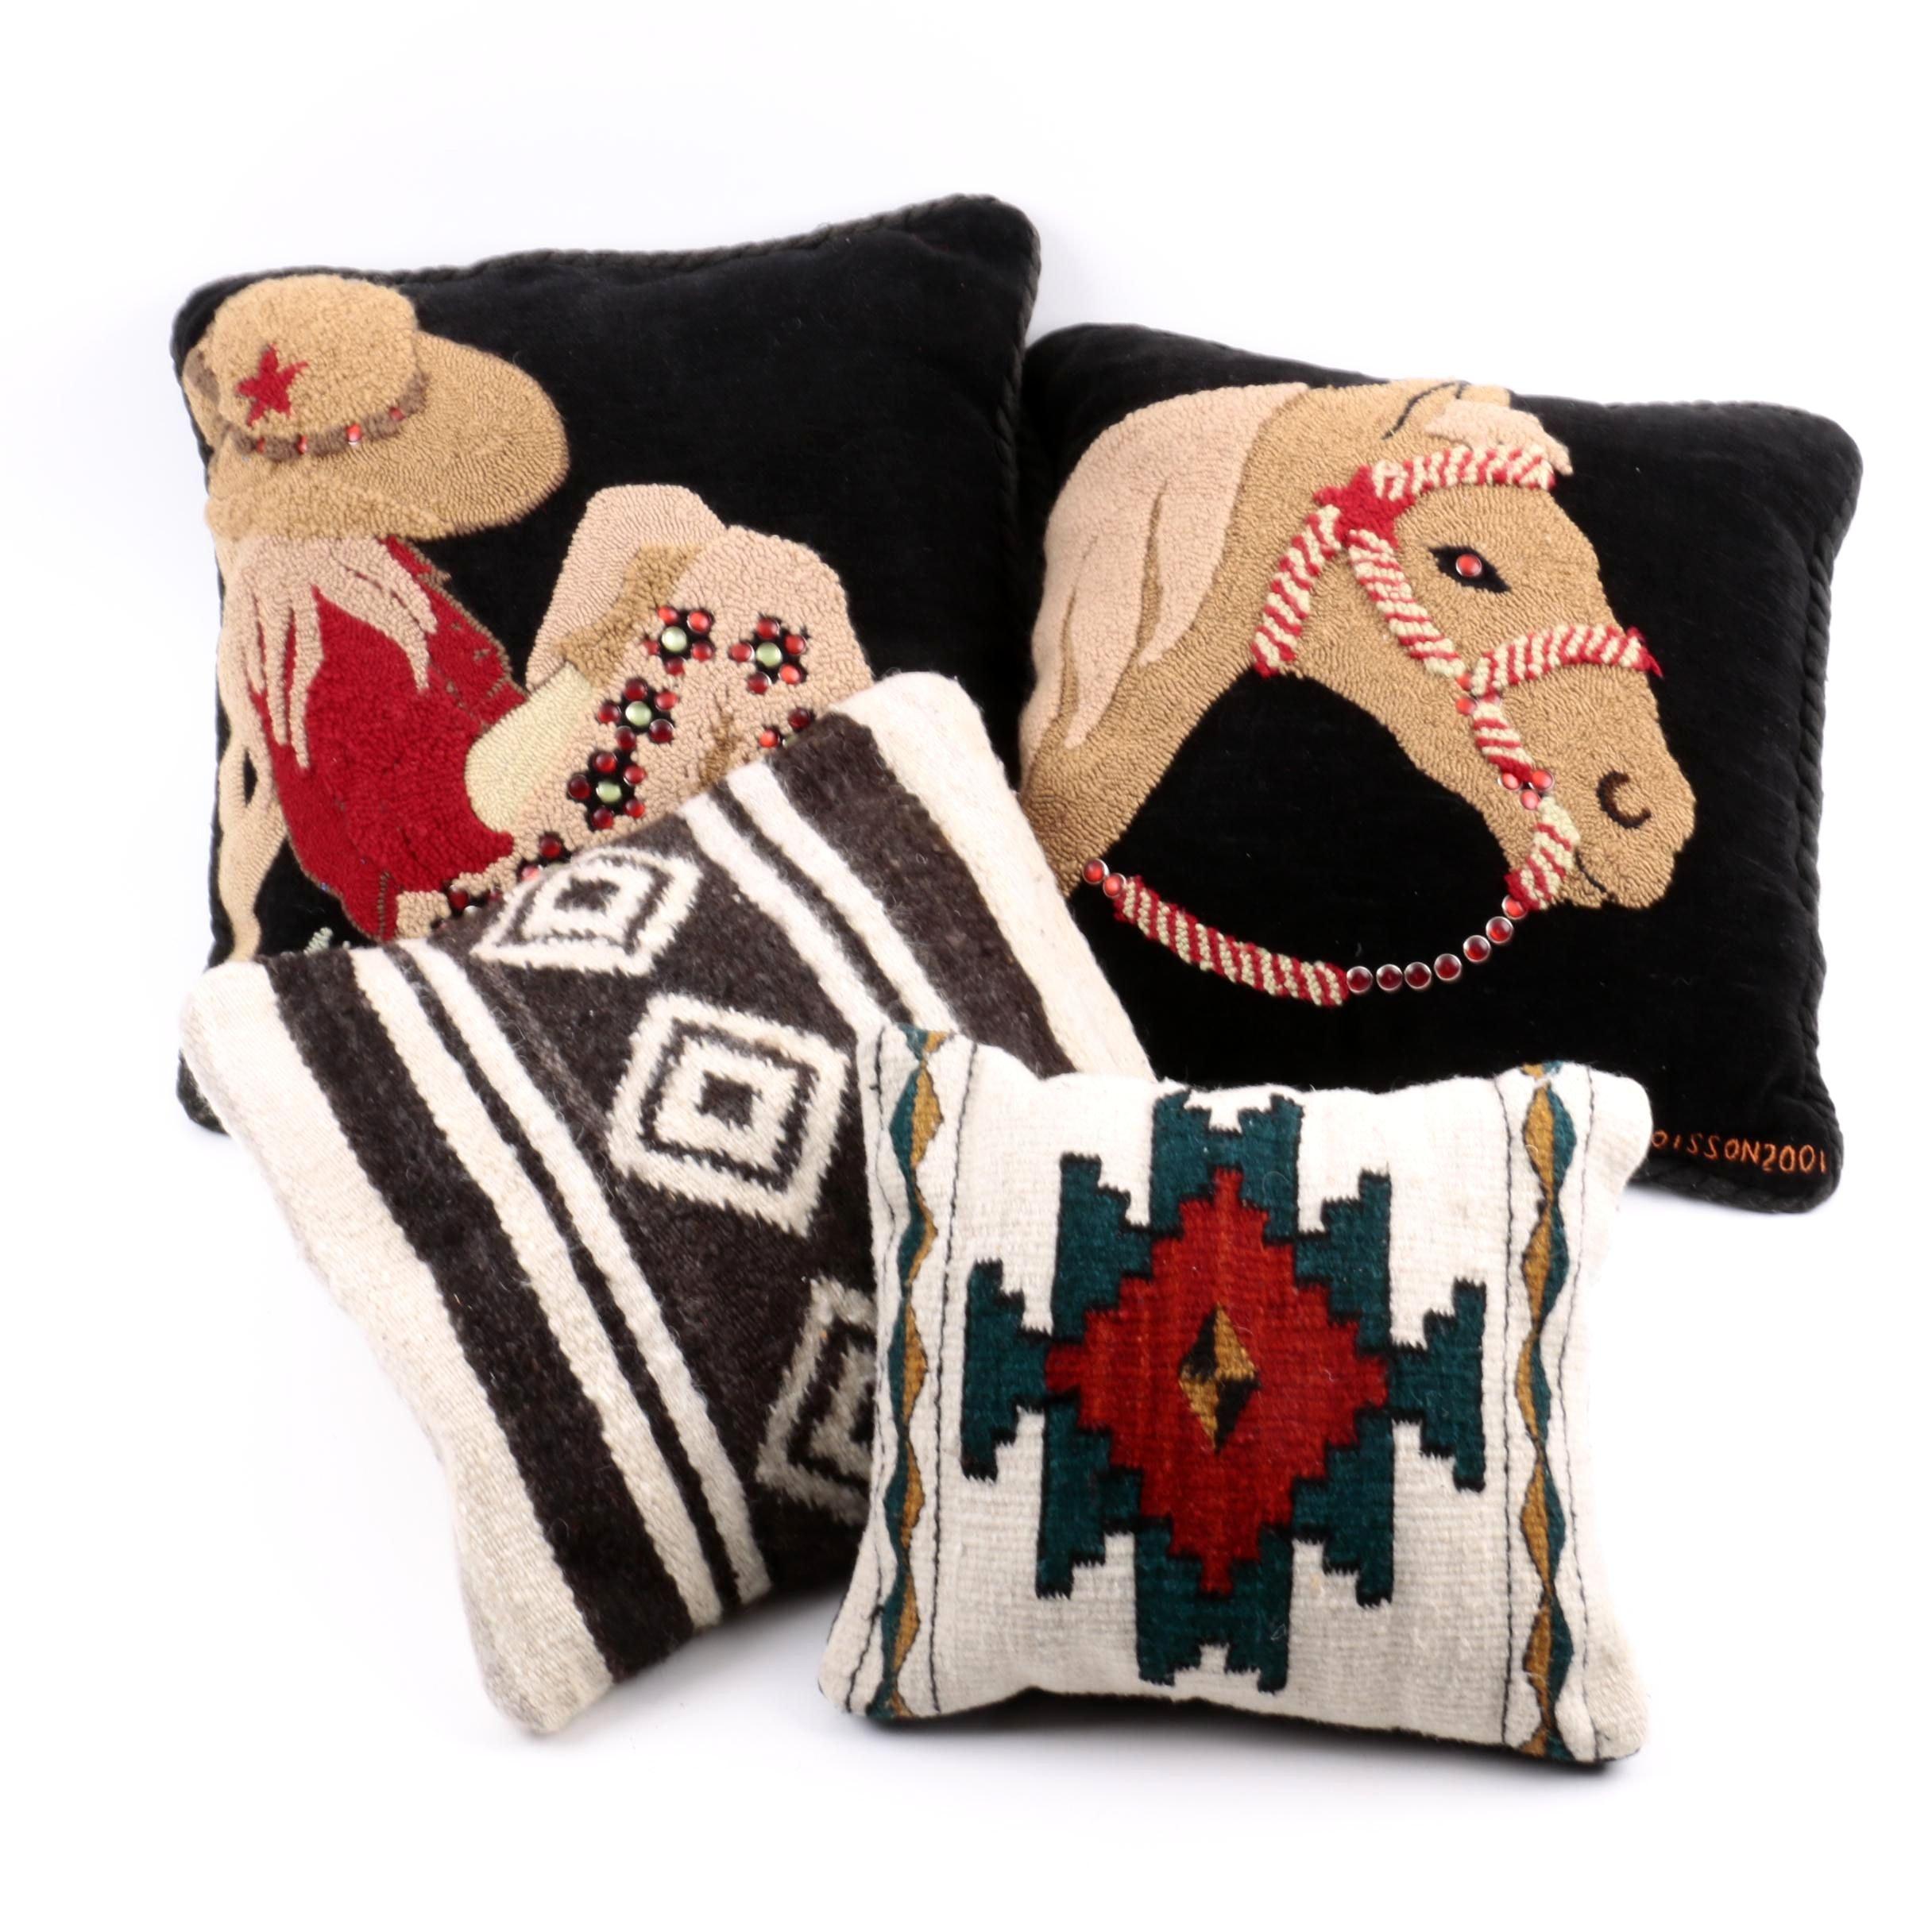 Judi Boisson Designed Throw Pillows